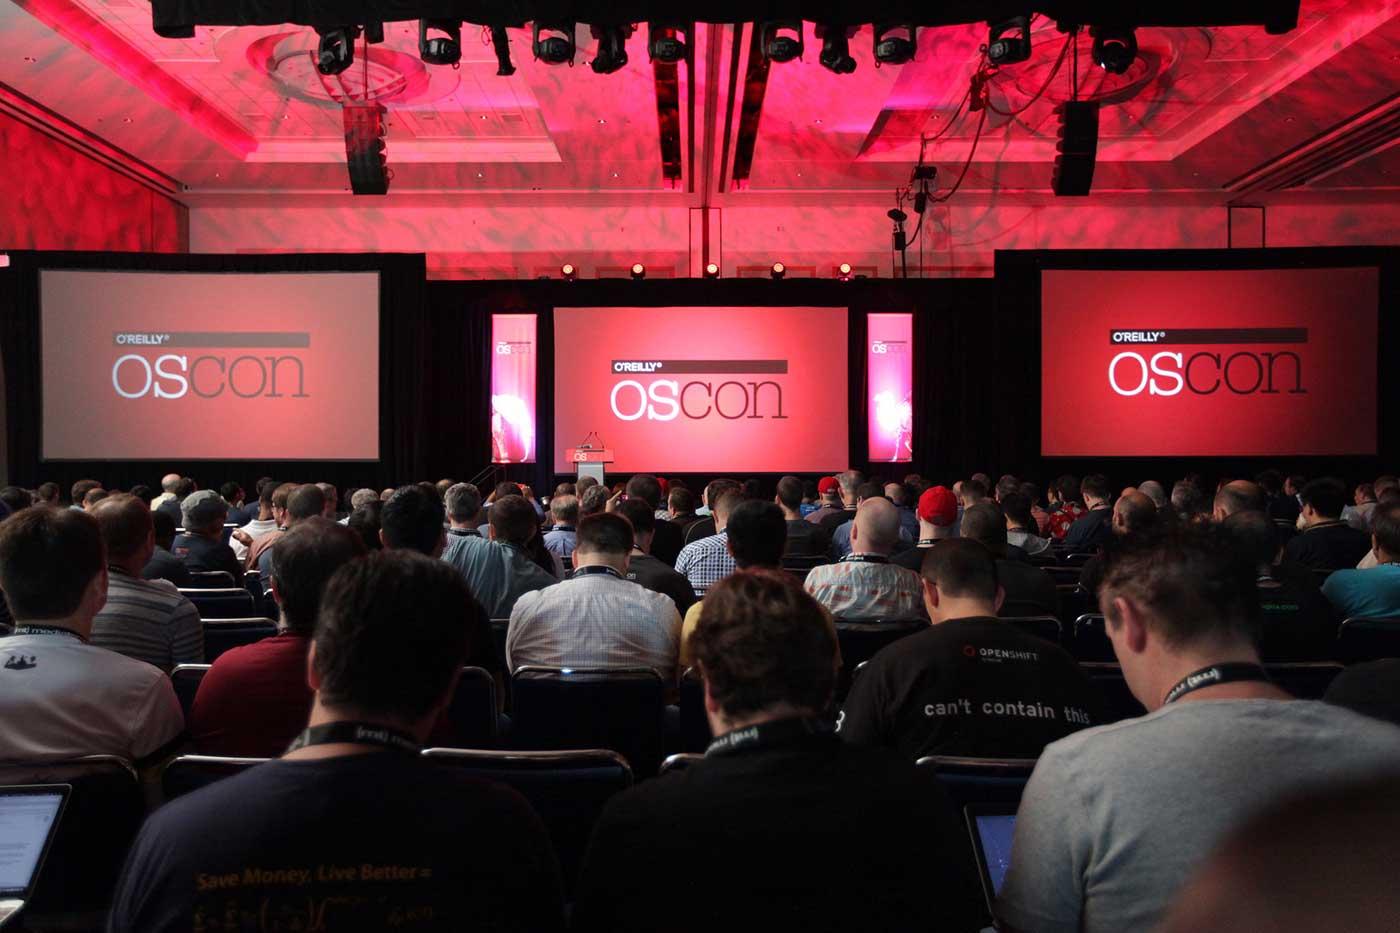 OSCON keynote stage